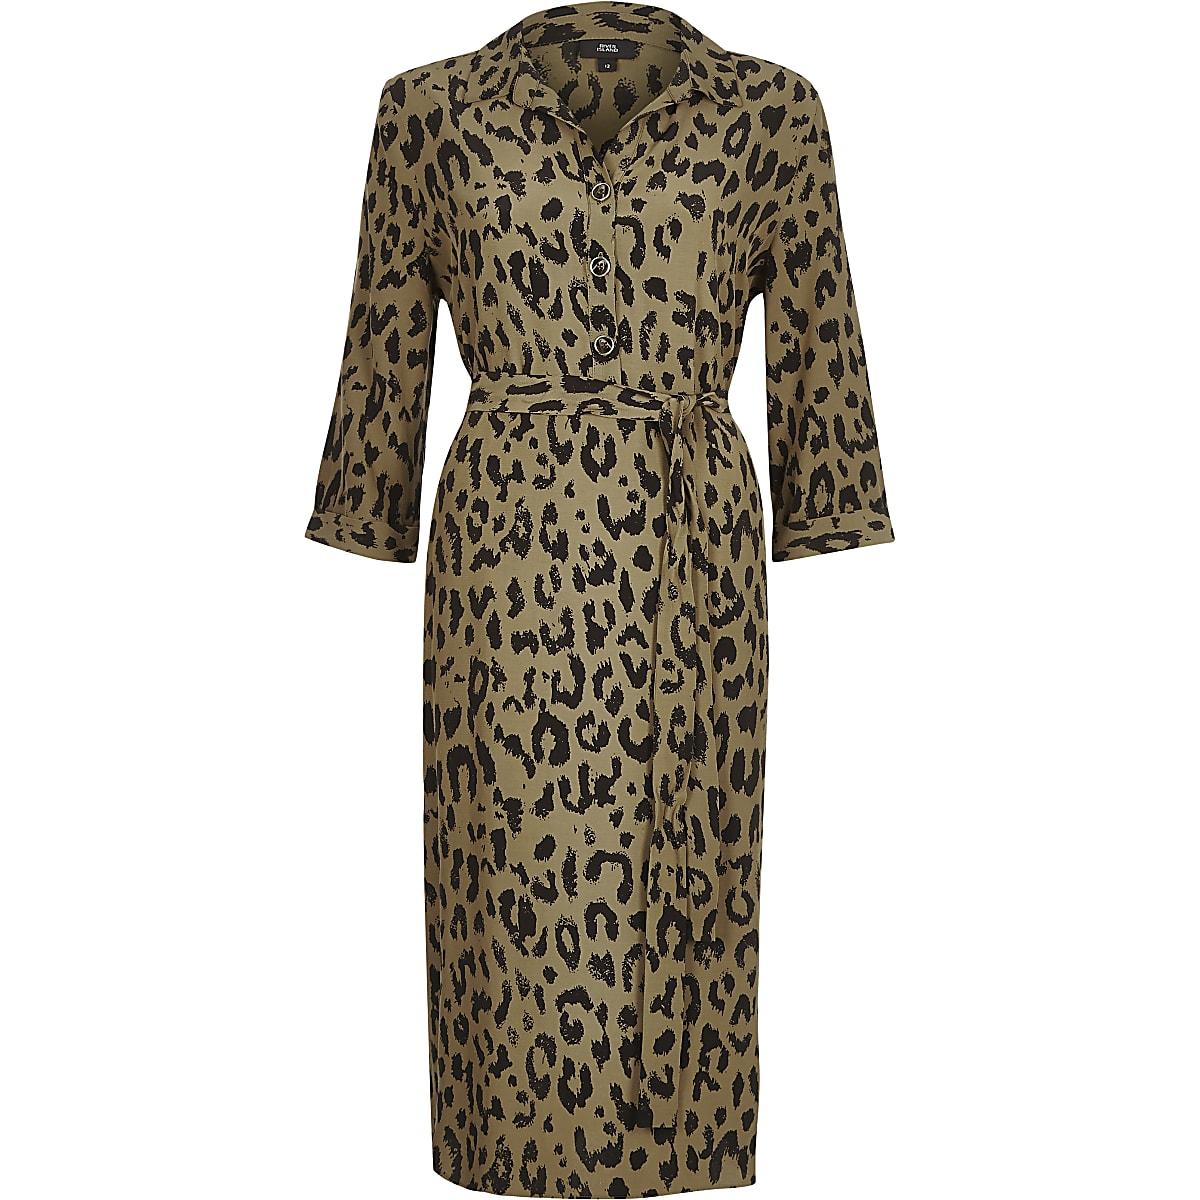 79bc426462f4 Khaki leopard print tie waist shirt dress - Shirt Dresses - Dresses ...